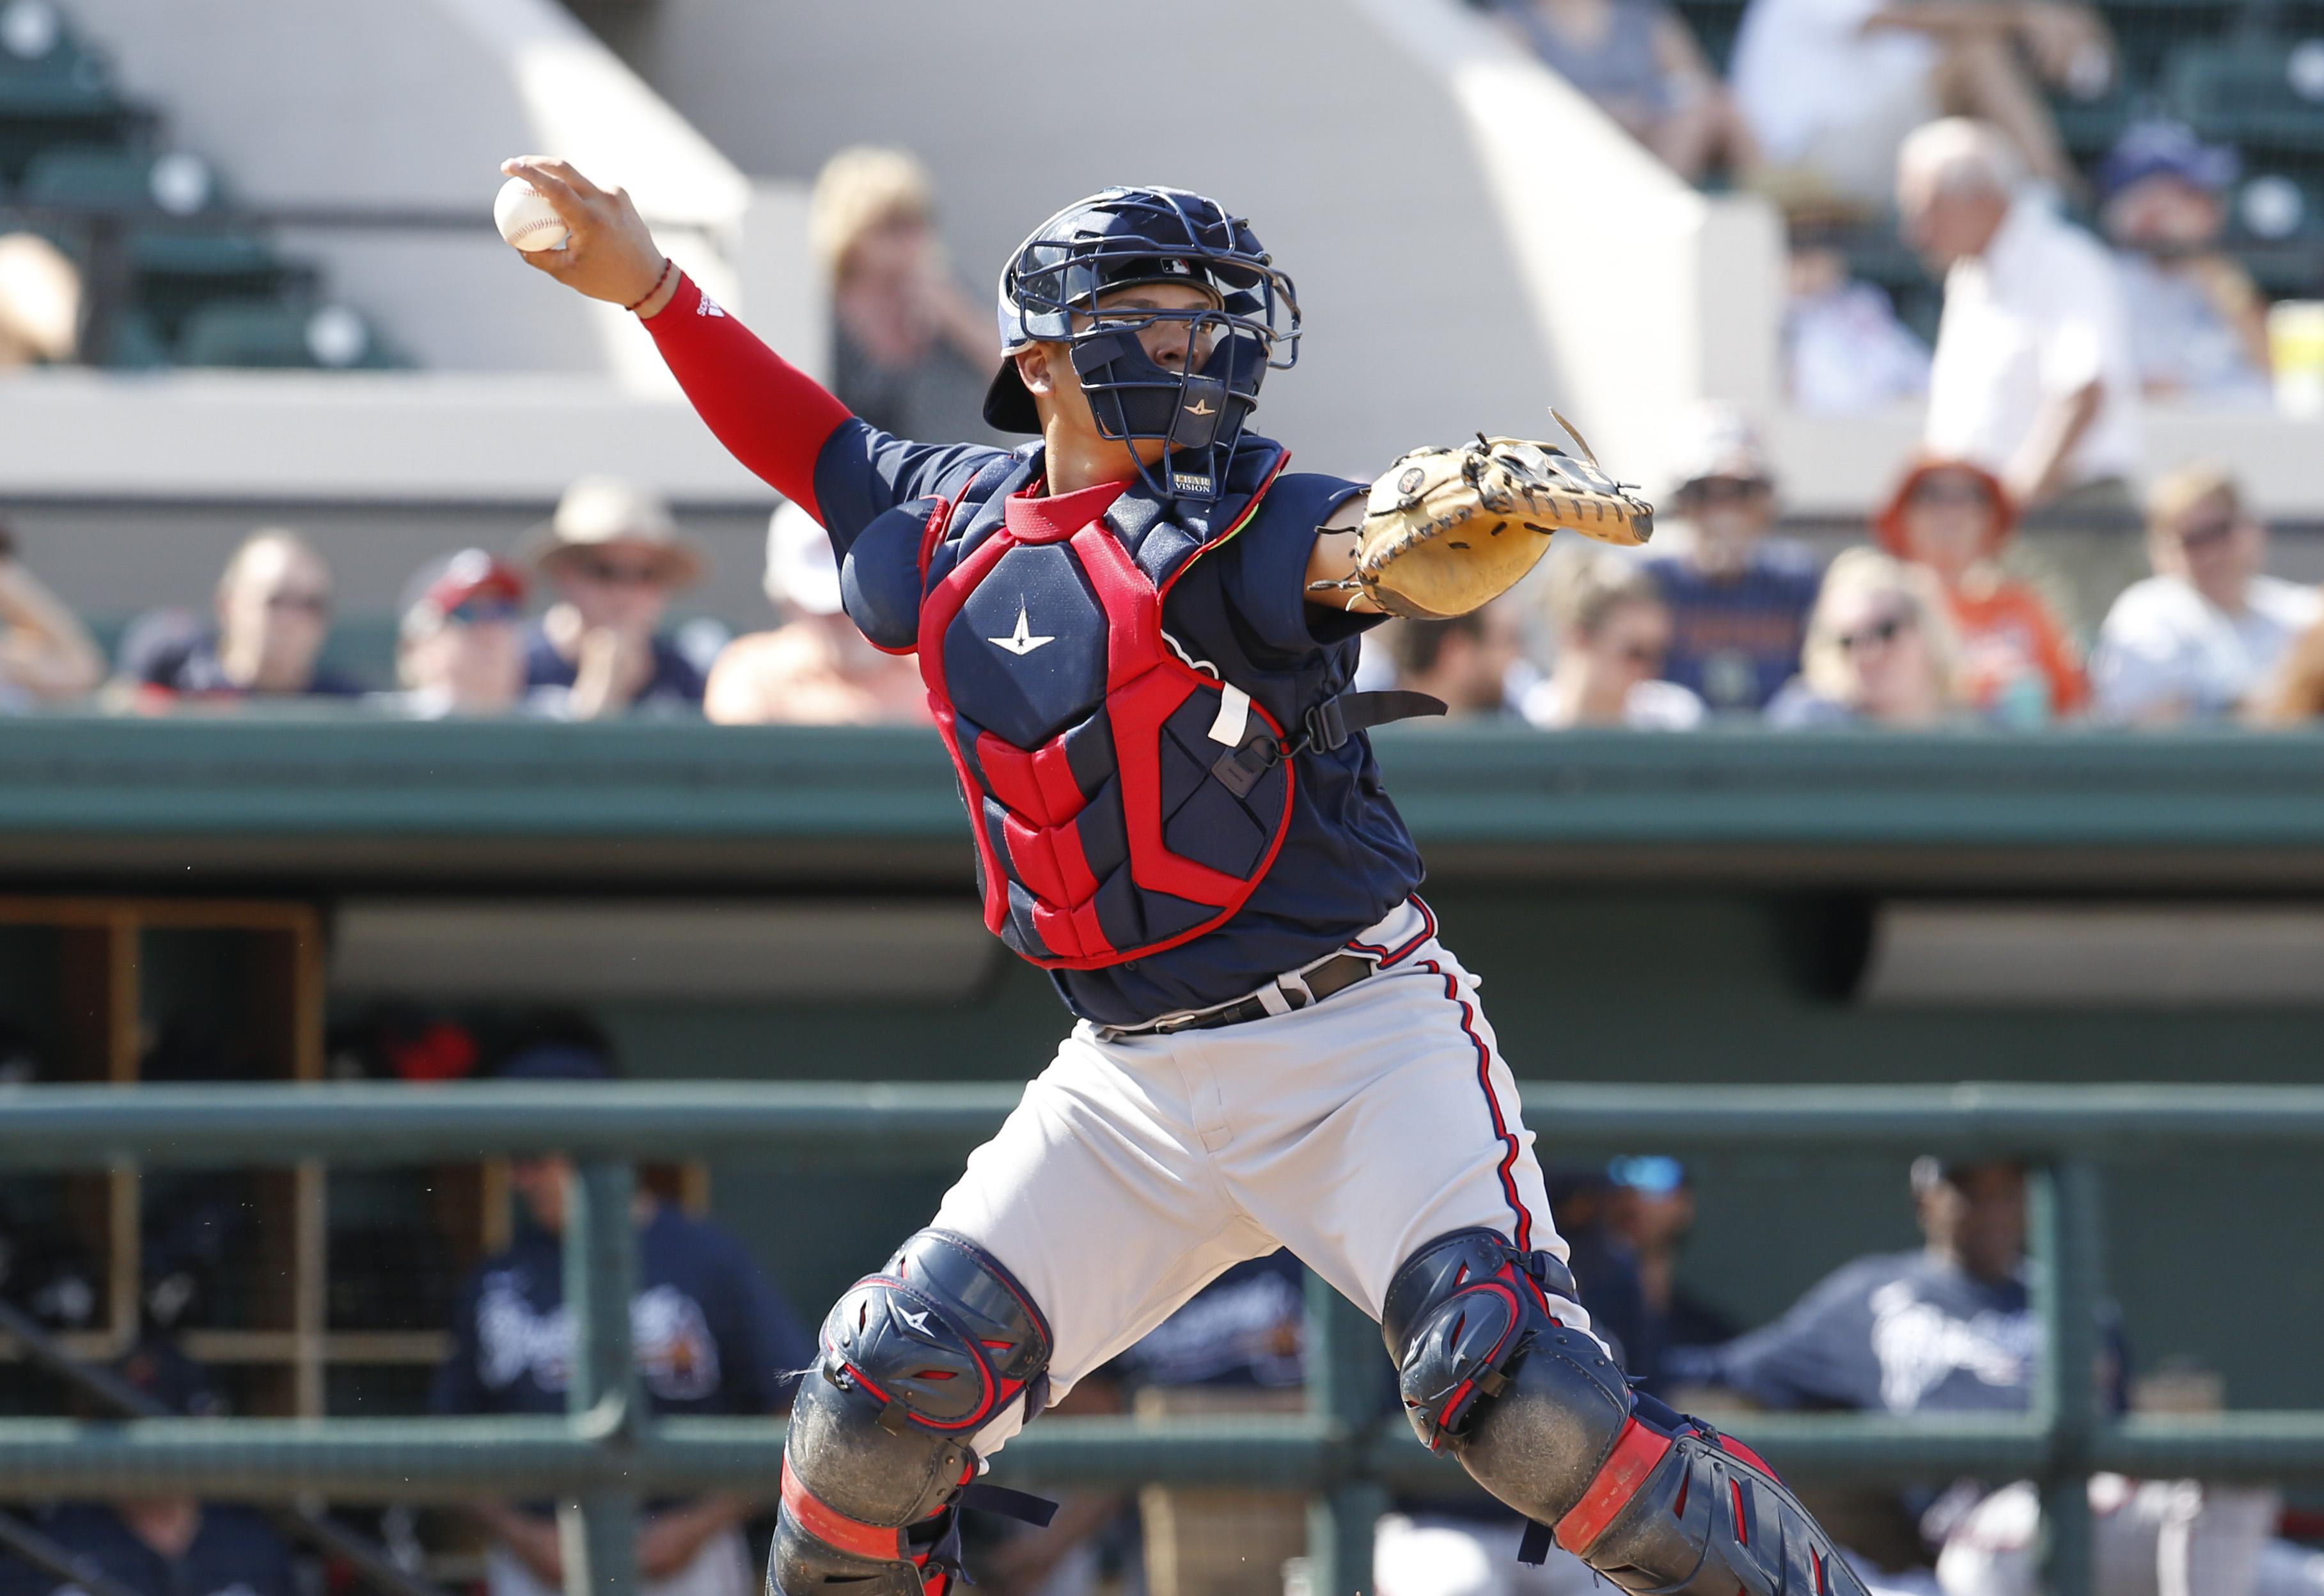 2020 MLB Season: How To Bet For The Upcoming Baseball Tournament